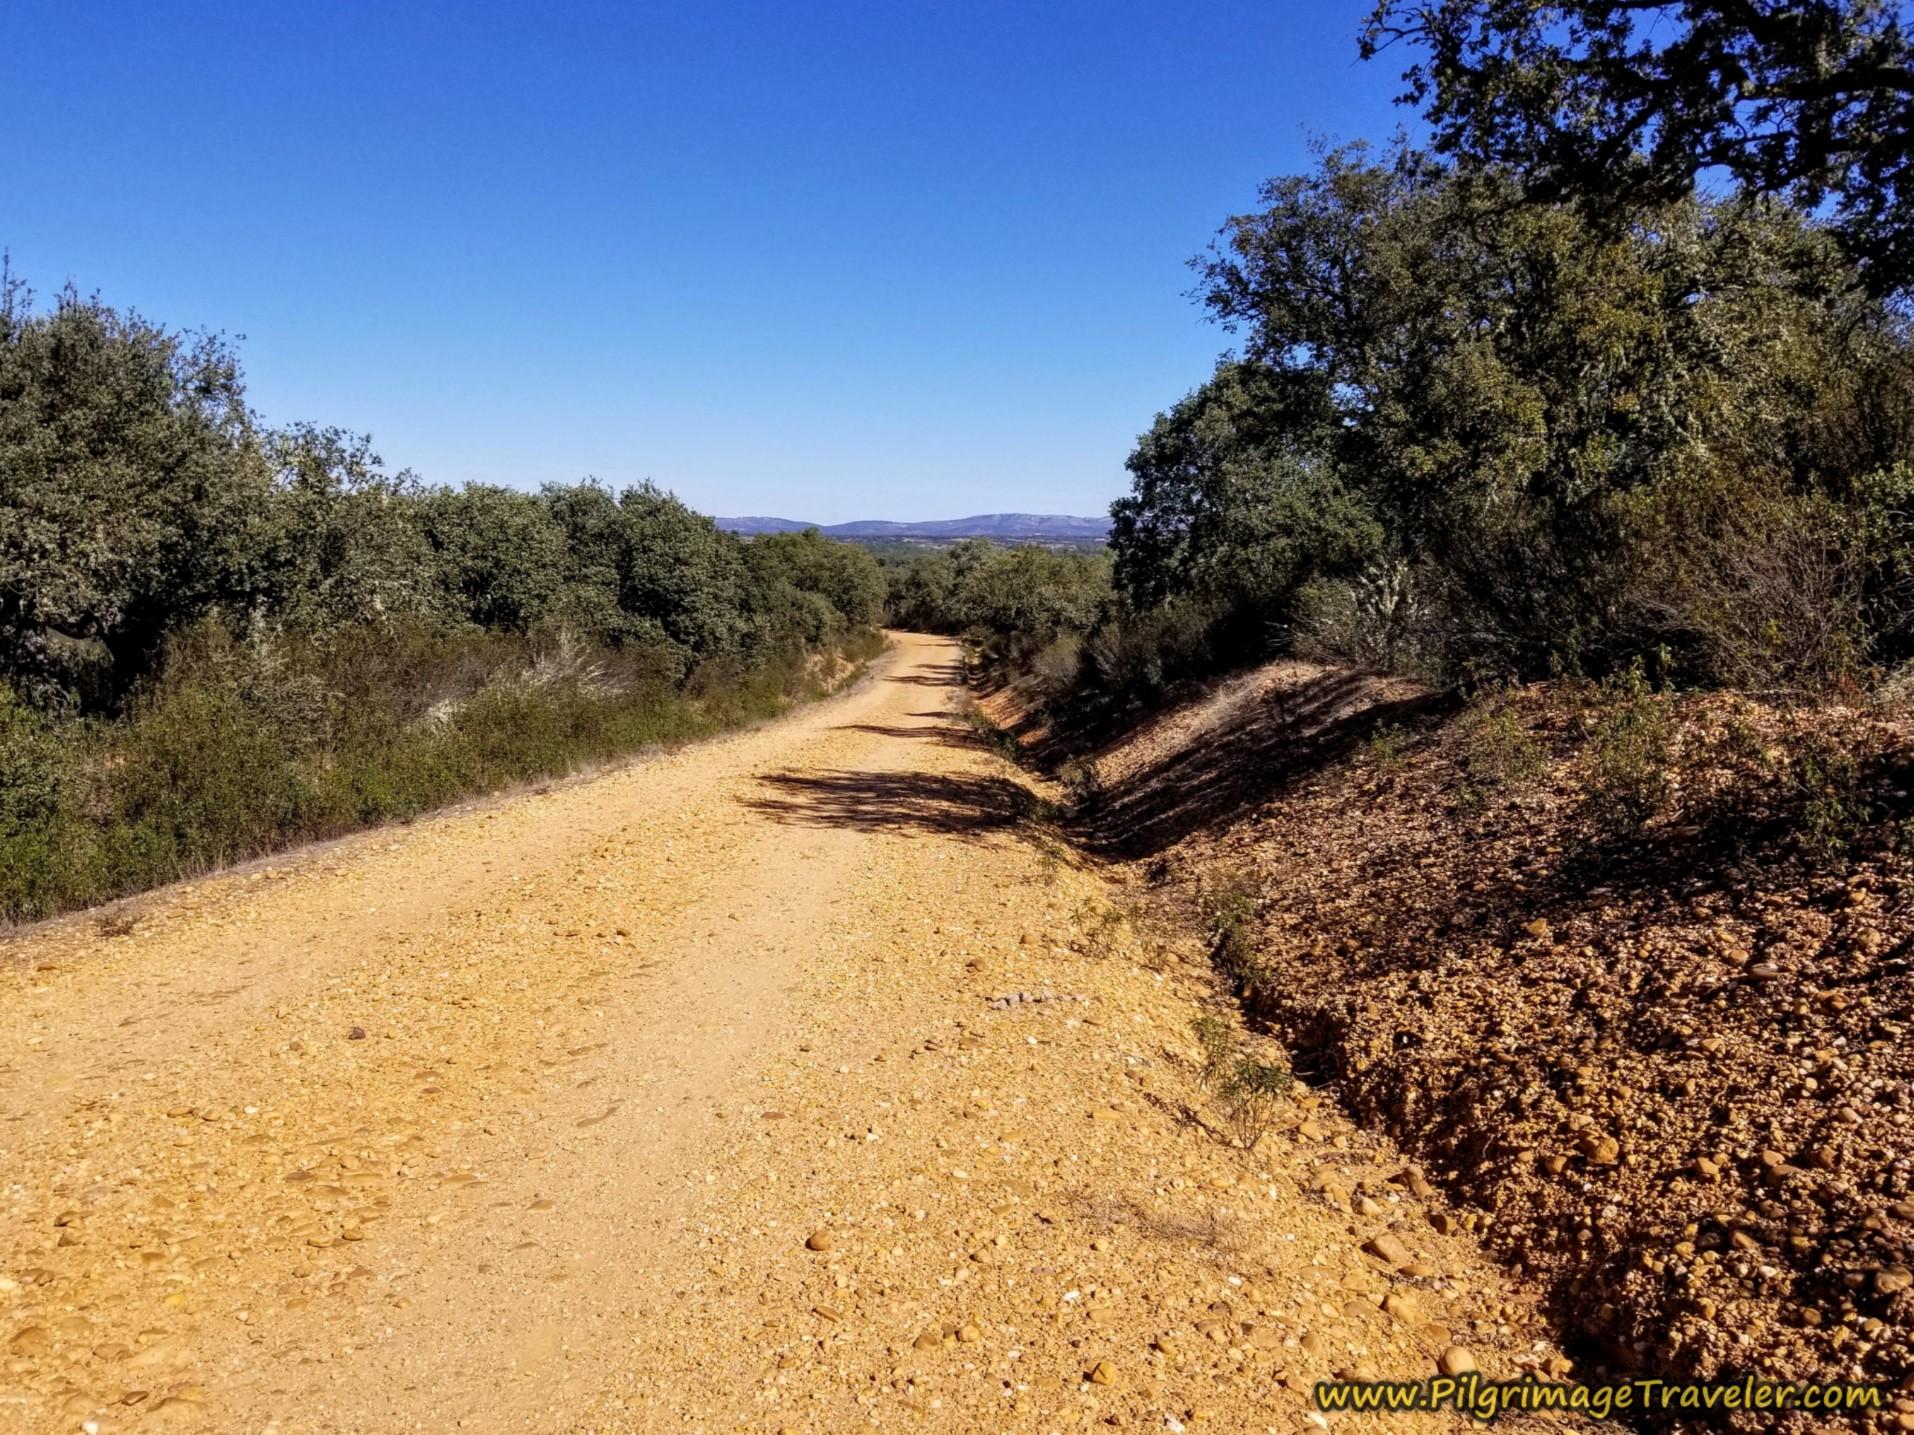 Downhill to Santa Croya de Tera Begins